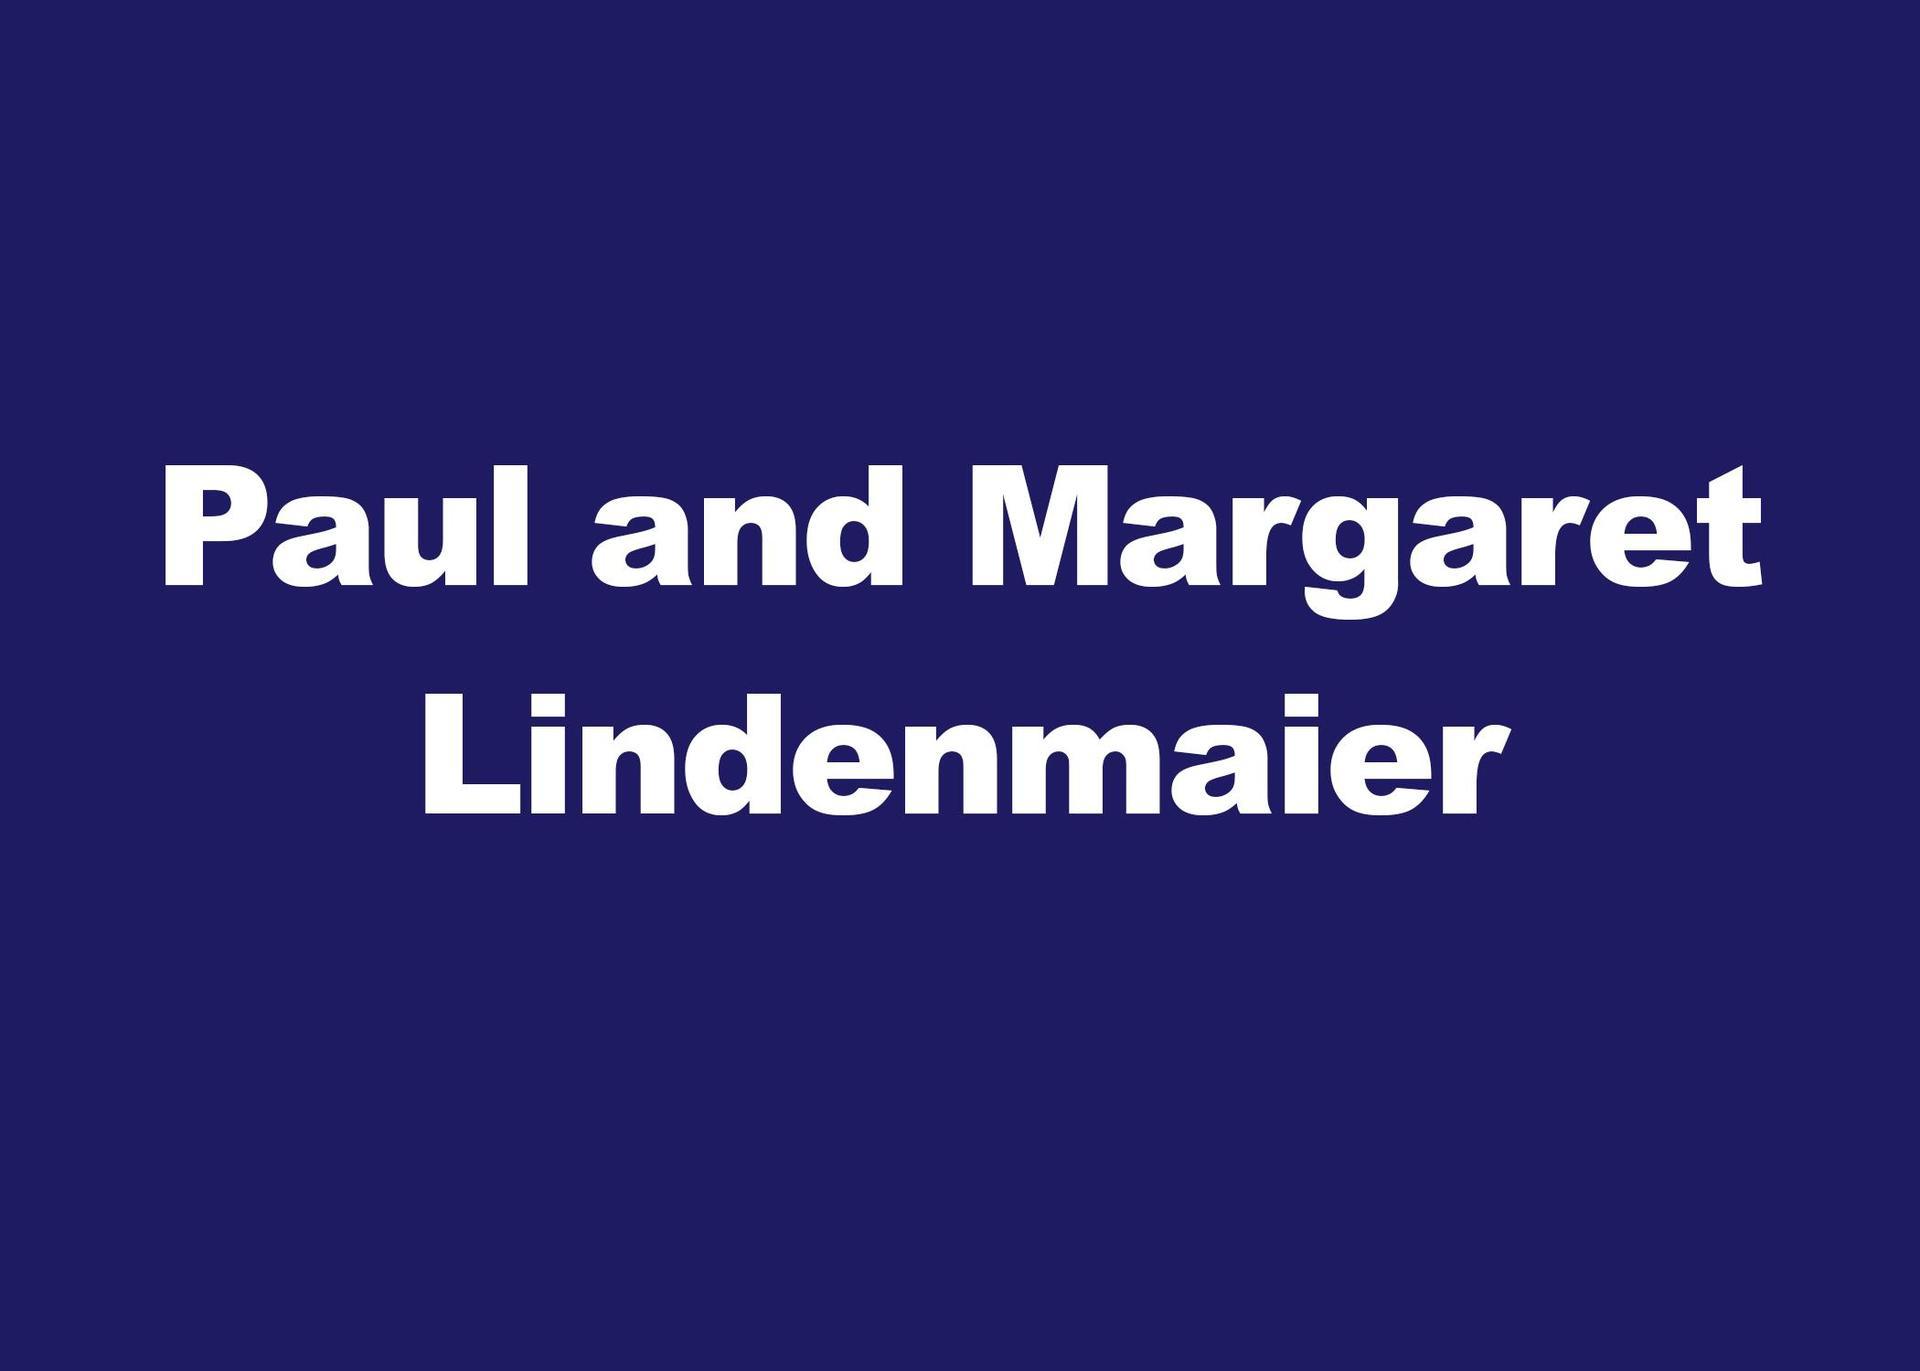 Paul & Margaret Lindenmaier